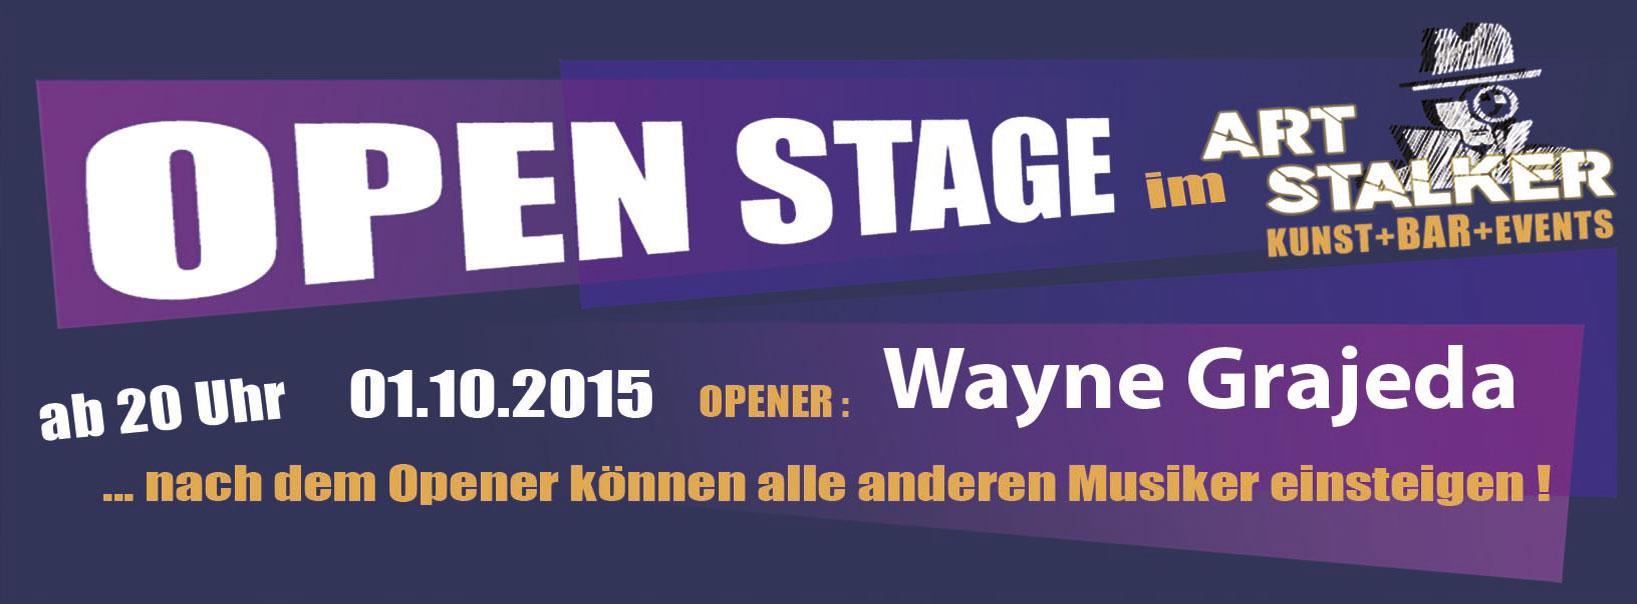 01.10_open_stage_wayne